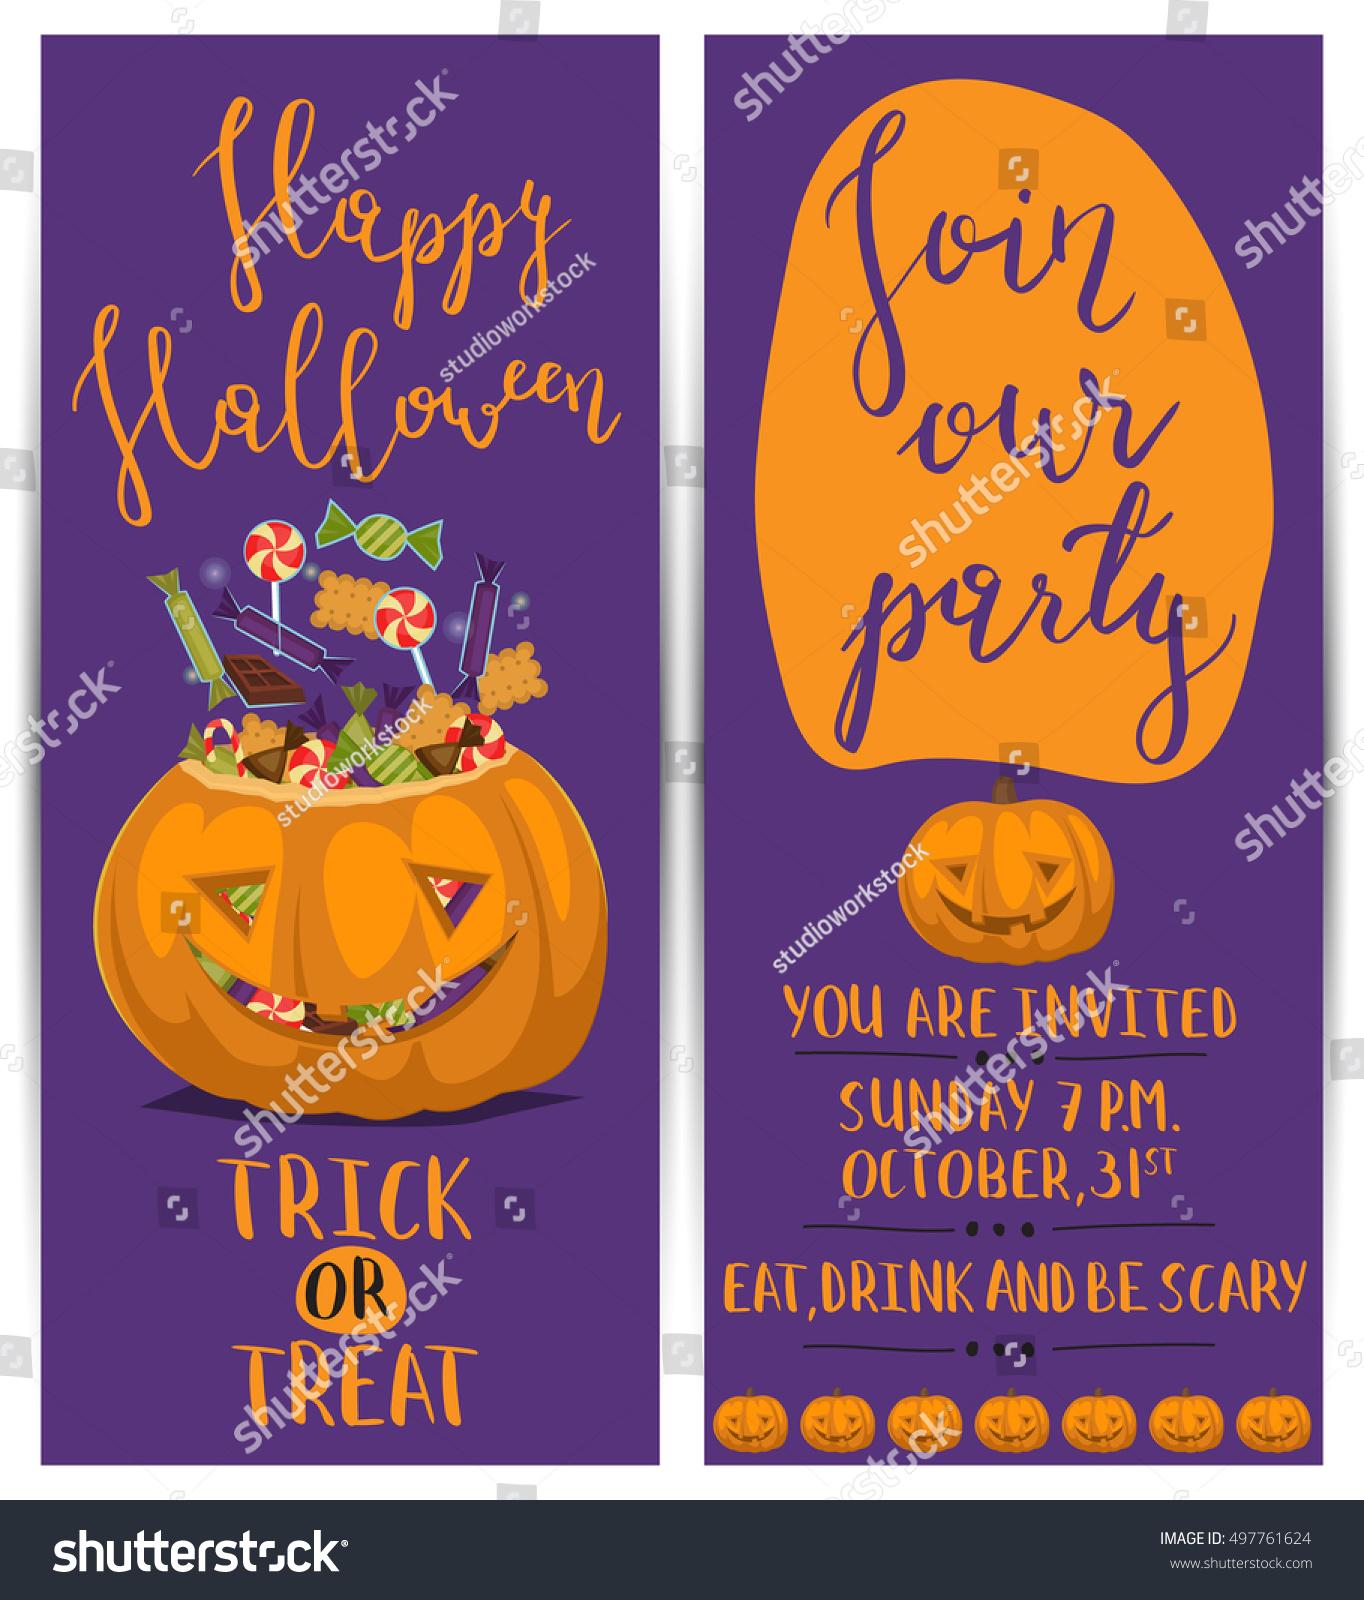 Vintage Halloween Party Flyers Scary Pumpkin Stock Vector 497761624 ...